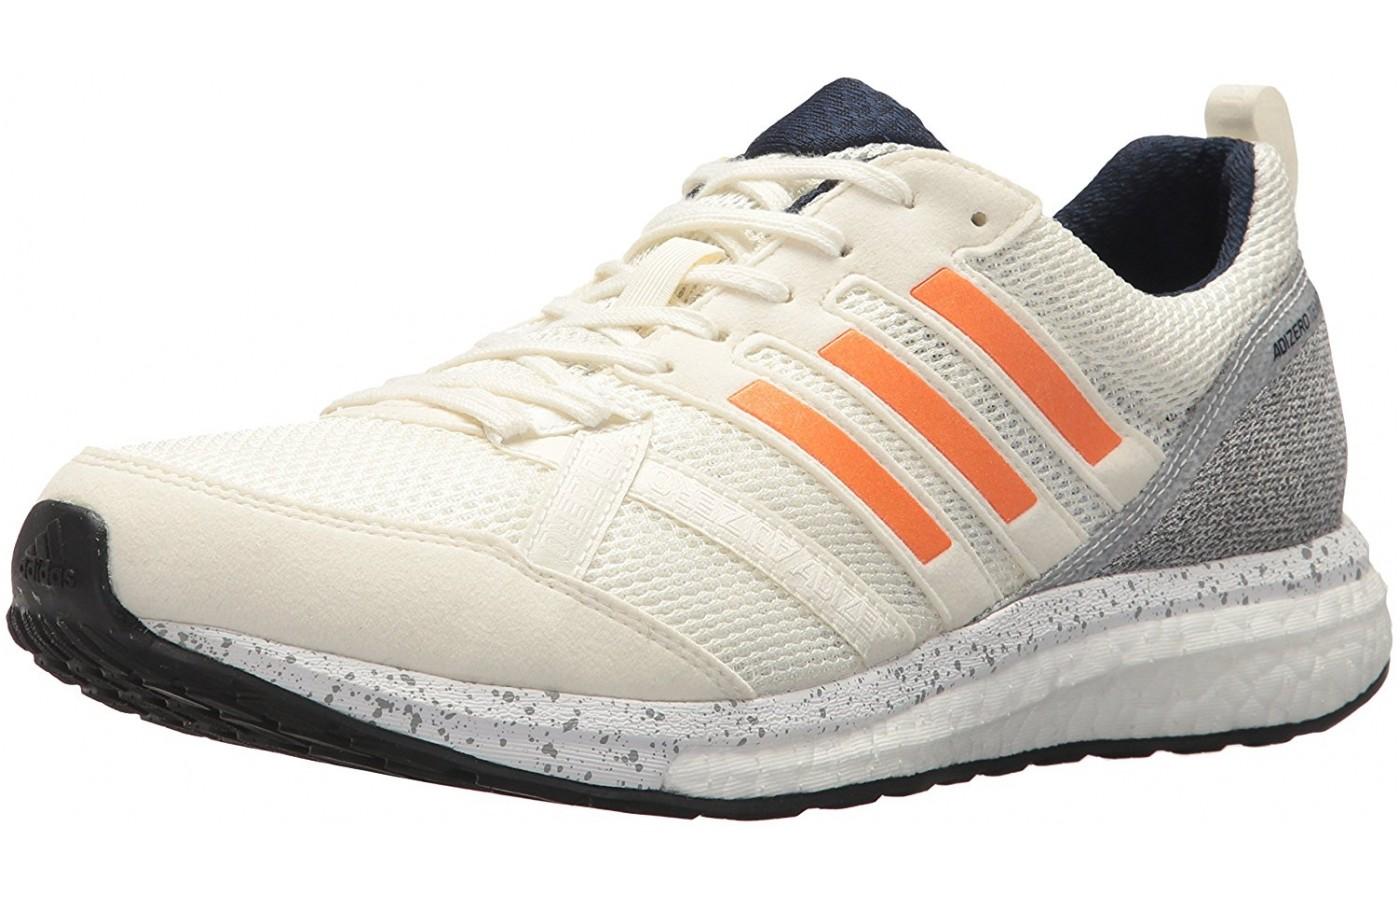 Adidas Adizero Tempo 8 angled